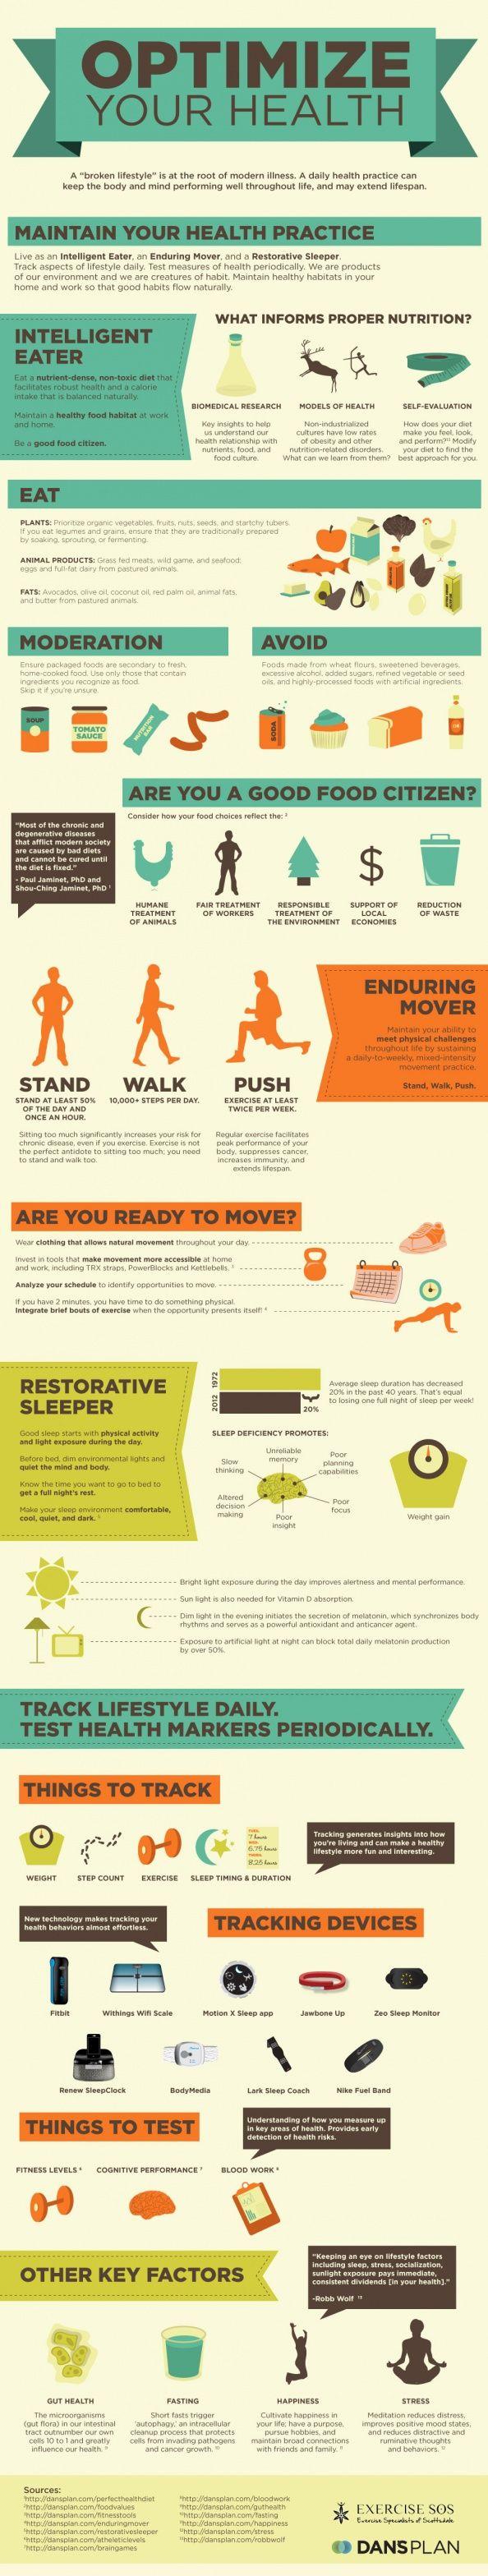 Optimize your heath; tips on #exercise, #eatright, sleep habits, and brain health